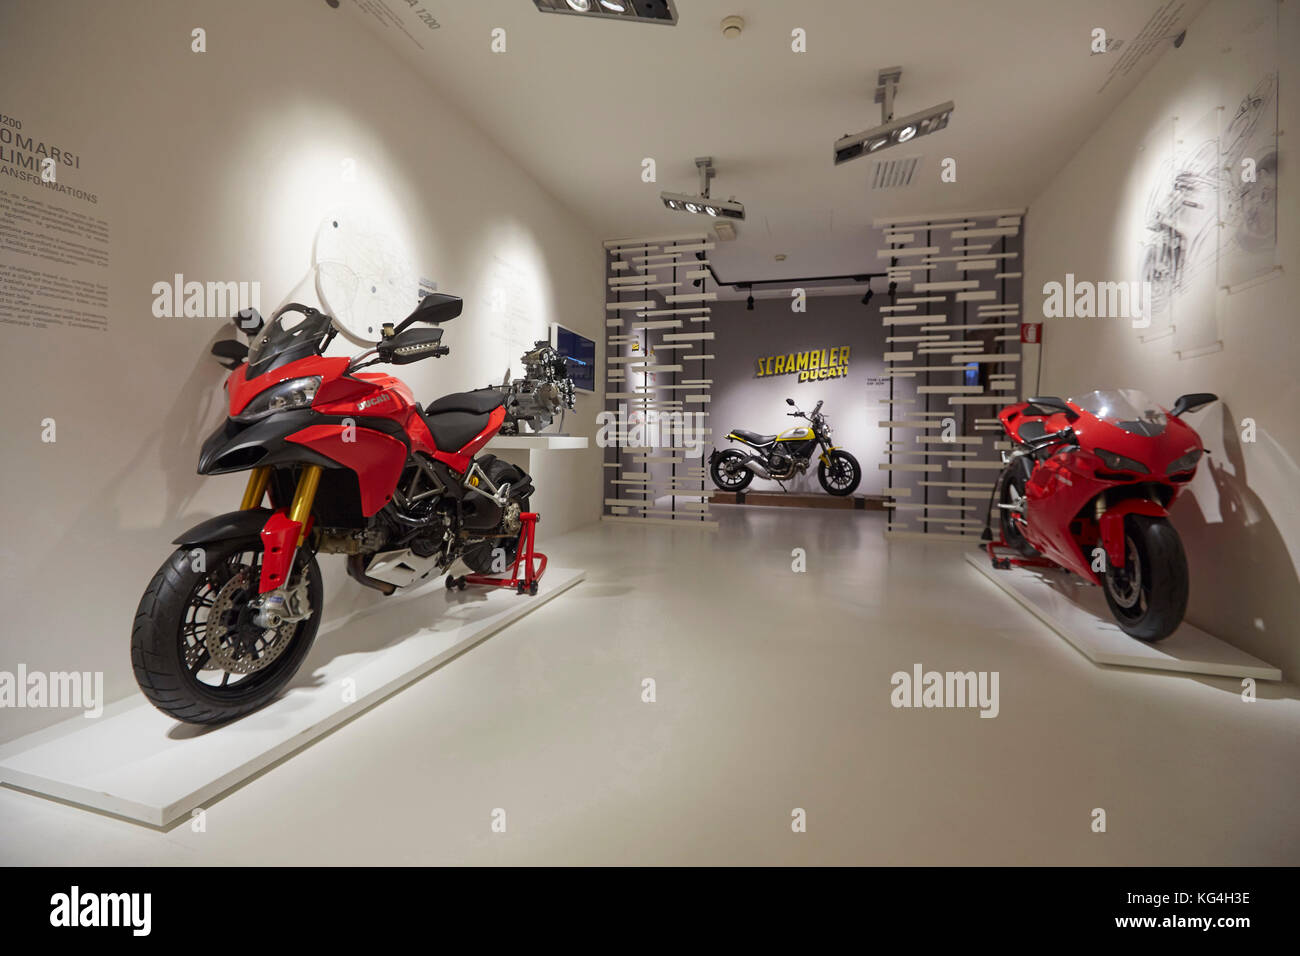 Left to right: Ducati Multistrada, Scrambler street bike, 1098 superbike on display at the Ducati factory museum, Stock Photo